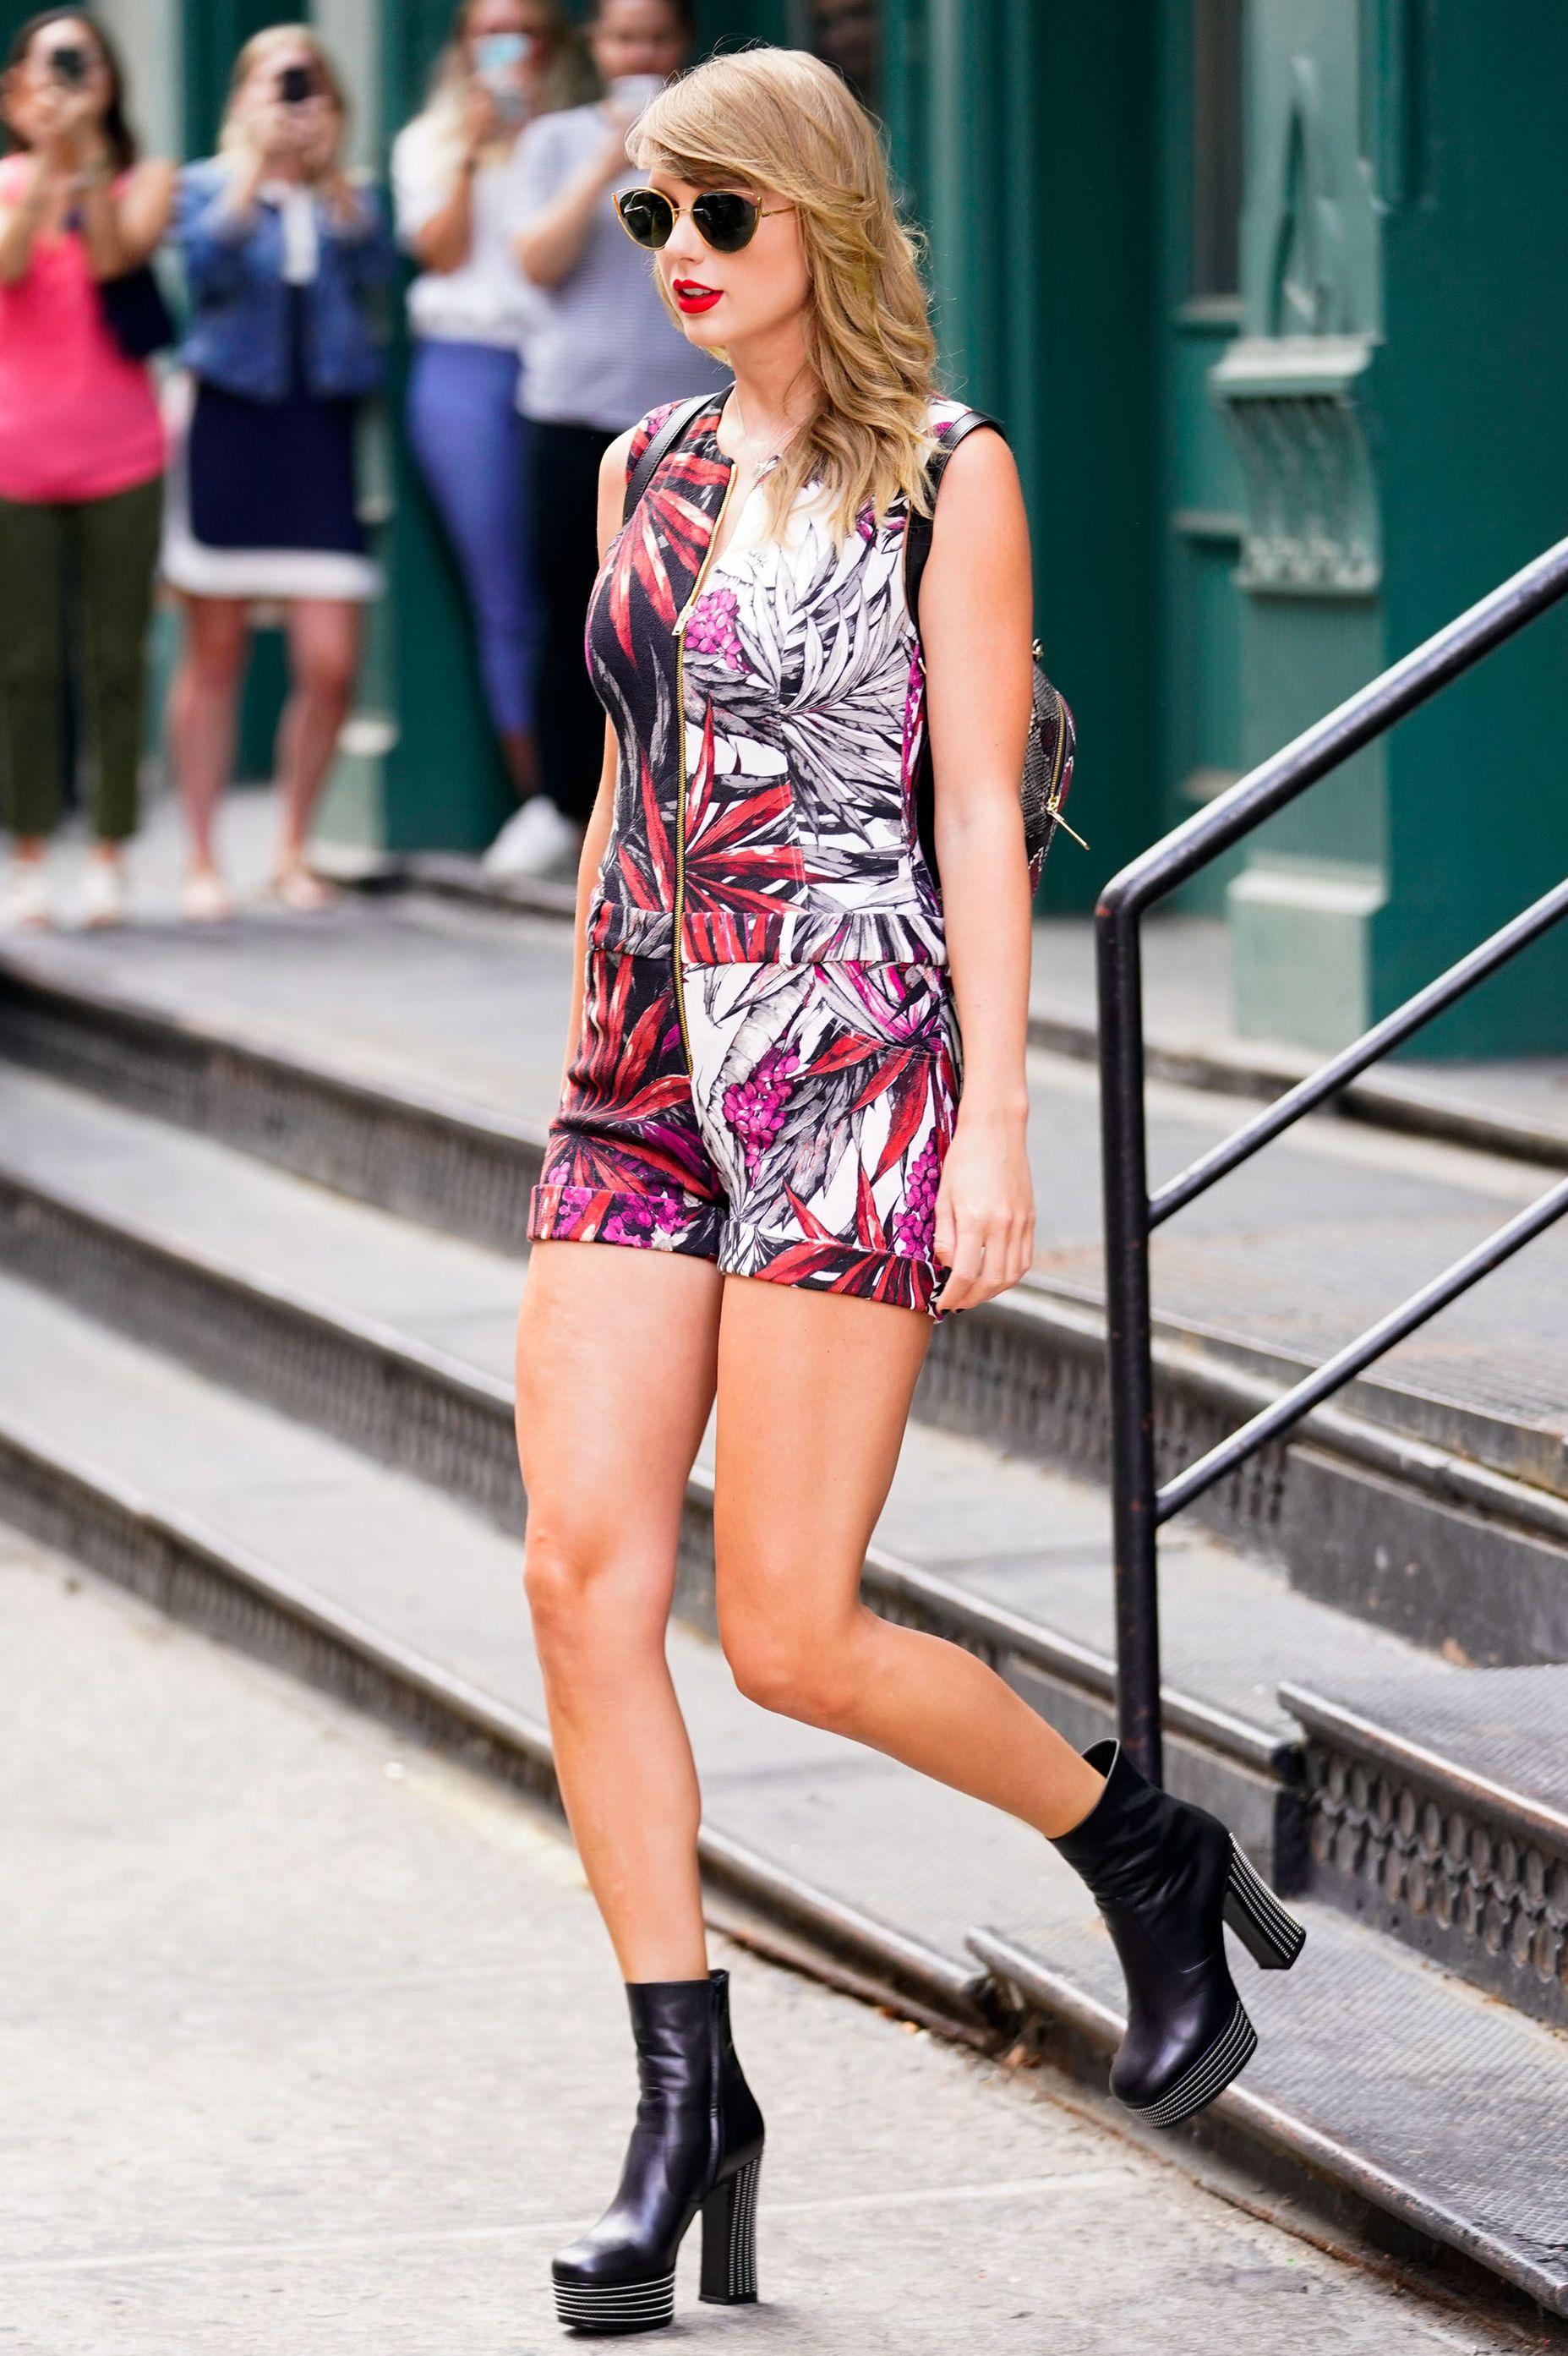 Taylor Swift, 泰勒斯, 女星私服穿搭, 女星私服, 女星街拍